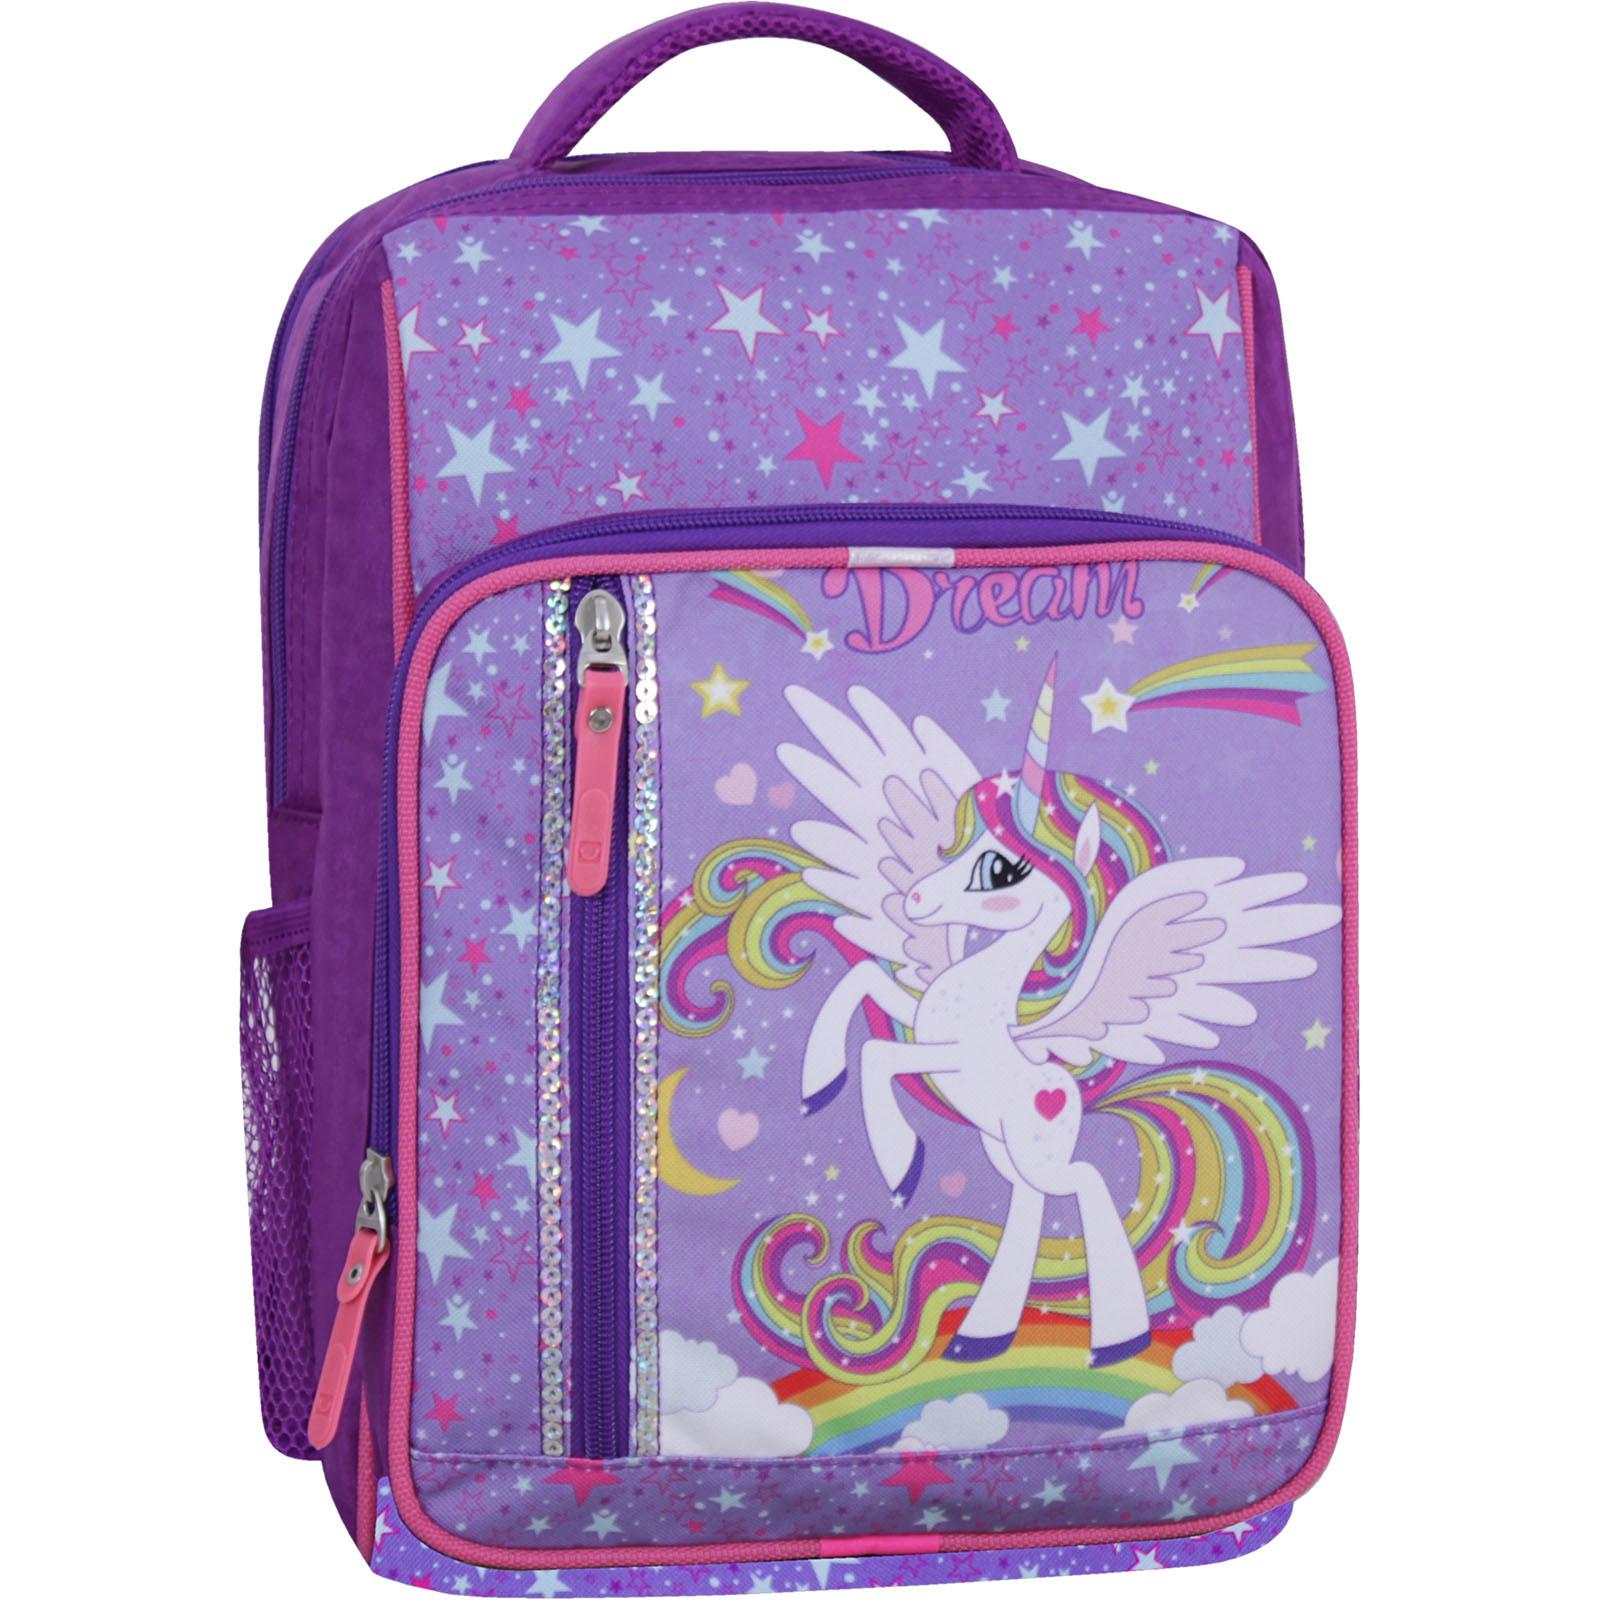 Школьные рюкзаки Рюкзак школьный Bagland Школьник 8 л. фиолетовый 674 (0012870) IMG_2683_суб.674_-1600.jpg